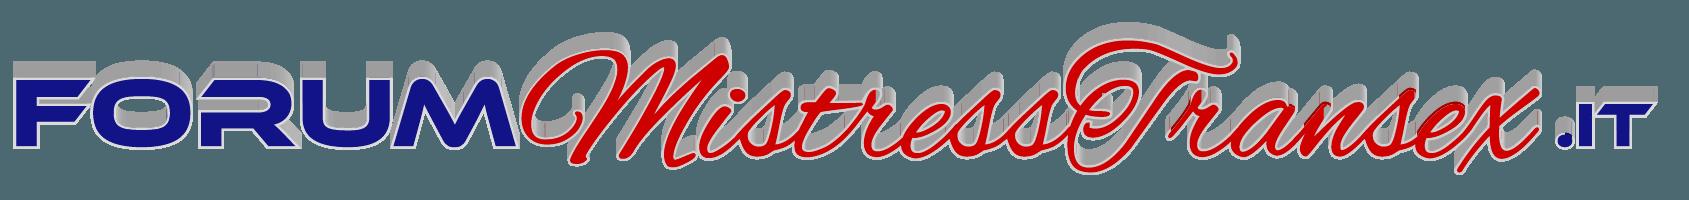 Logo del Forum di recensioni mistress transex